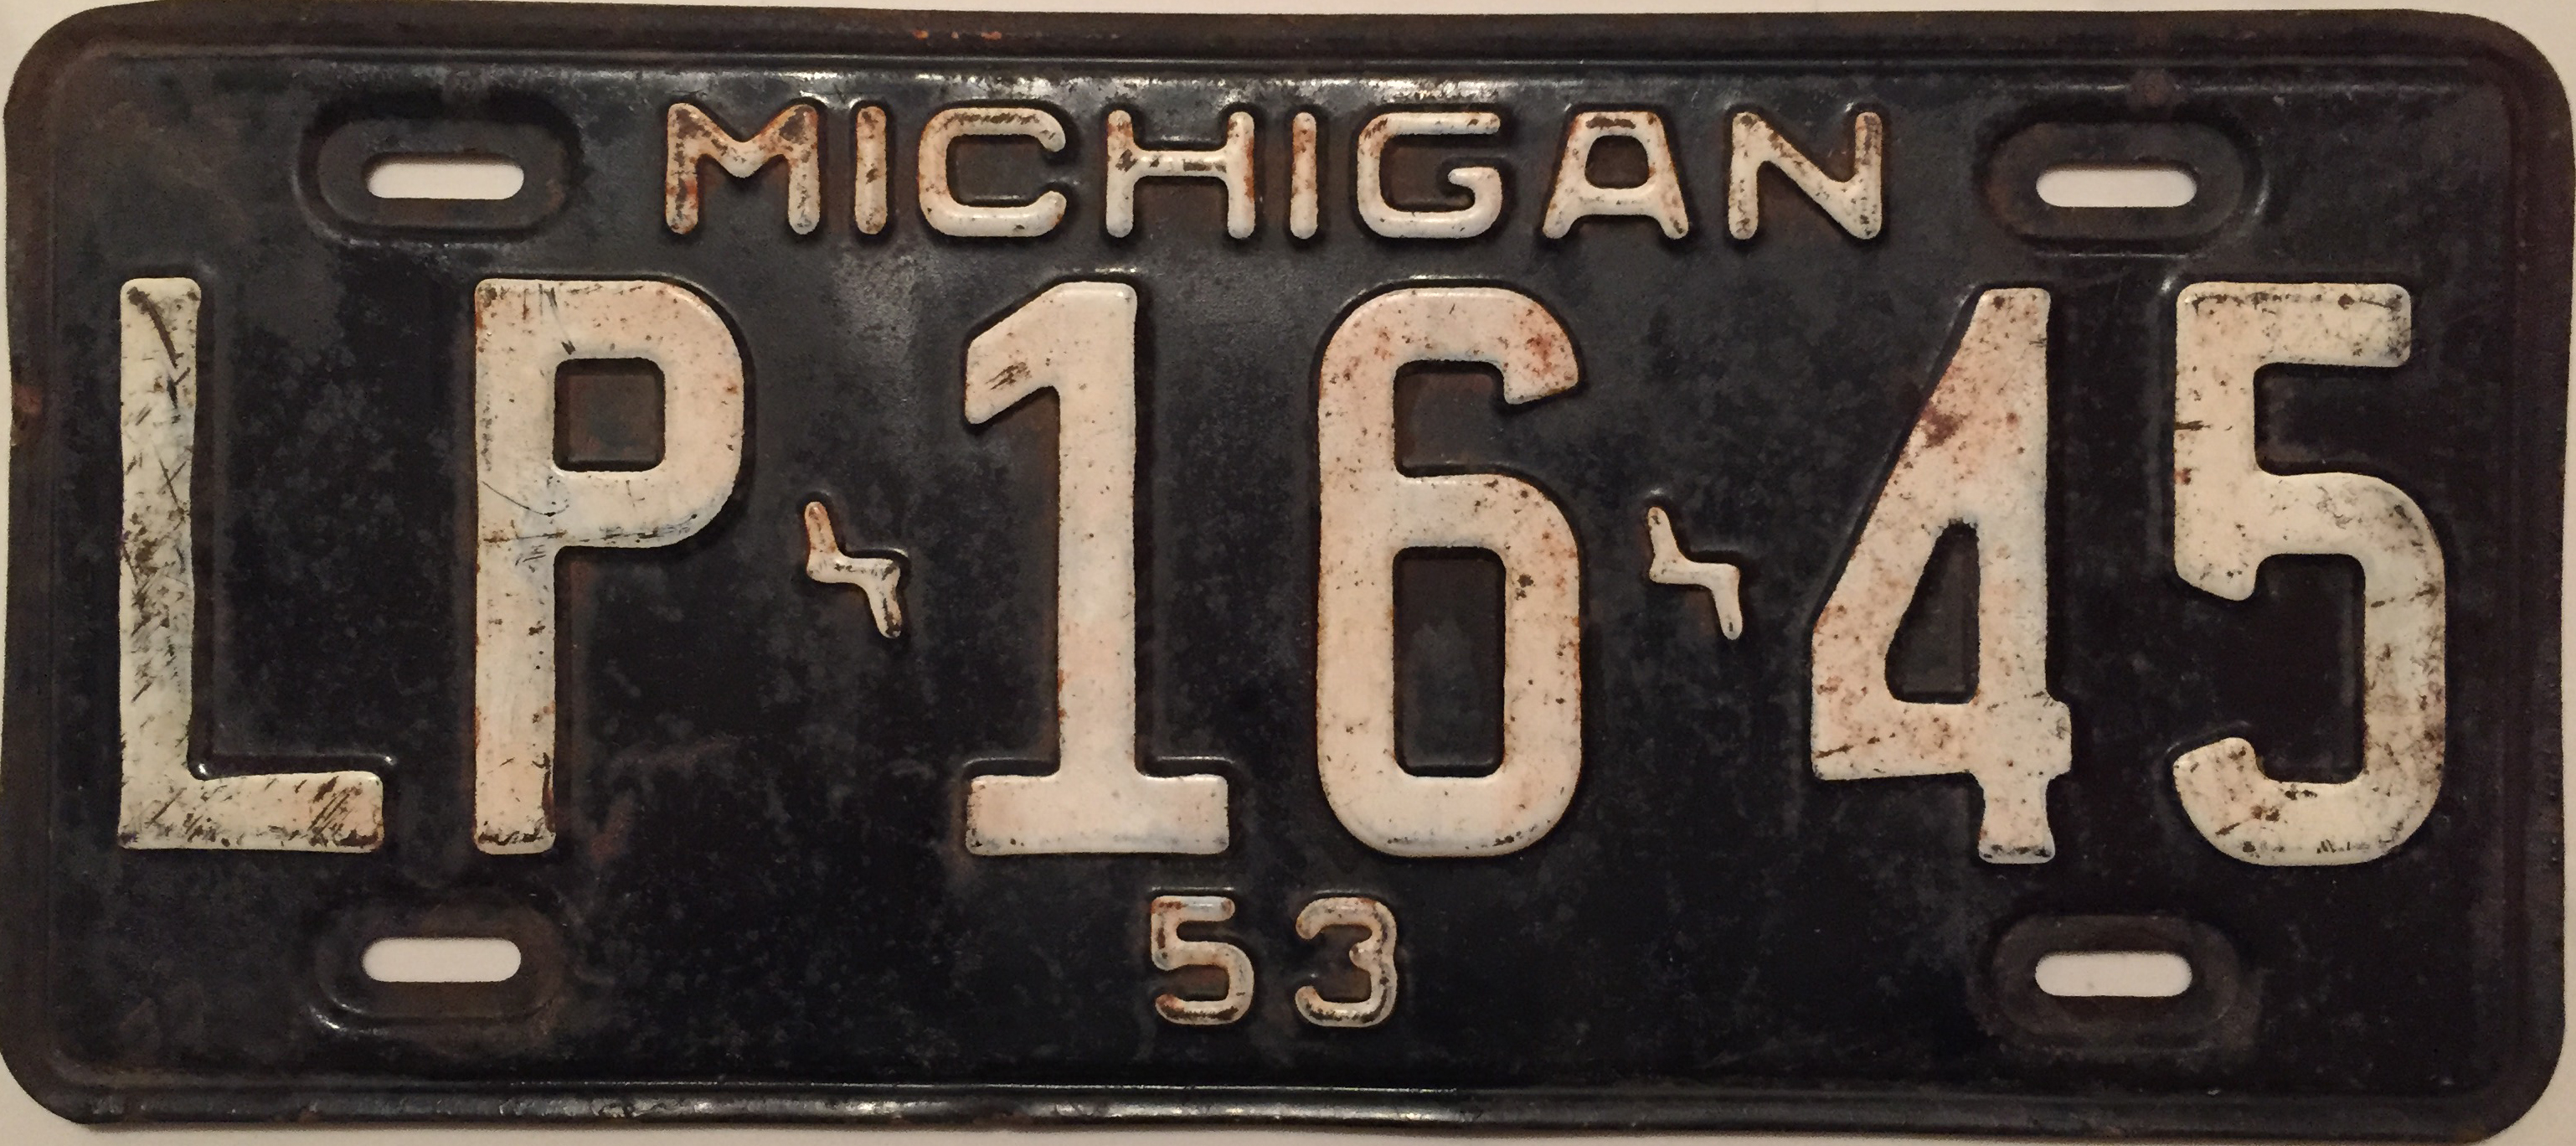 File:1953 Michigan License Plate.JPG - Wikimedia Commons